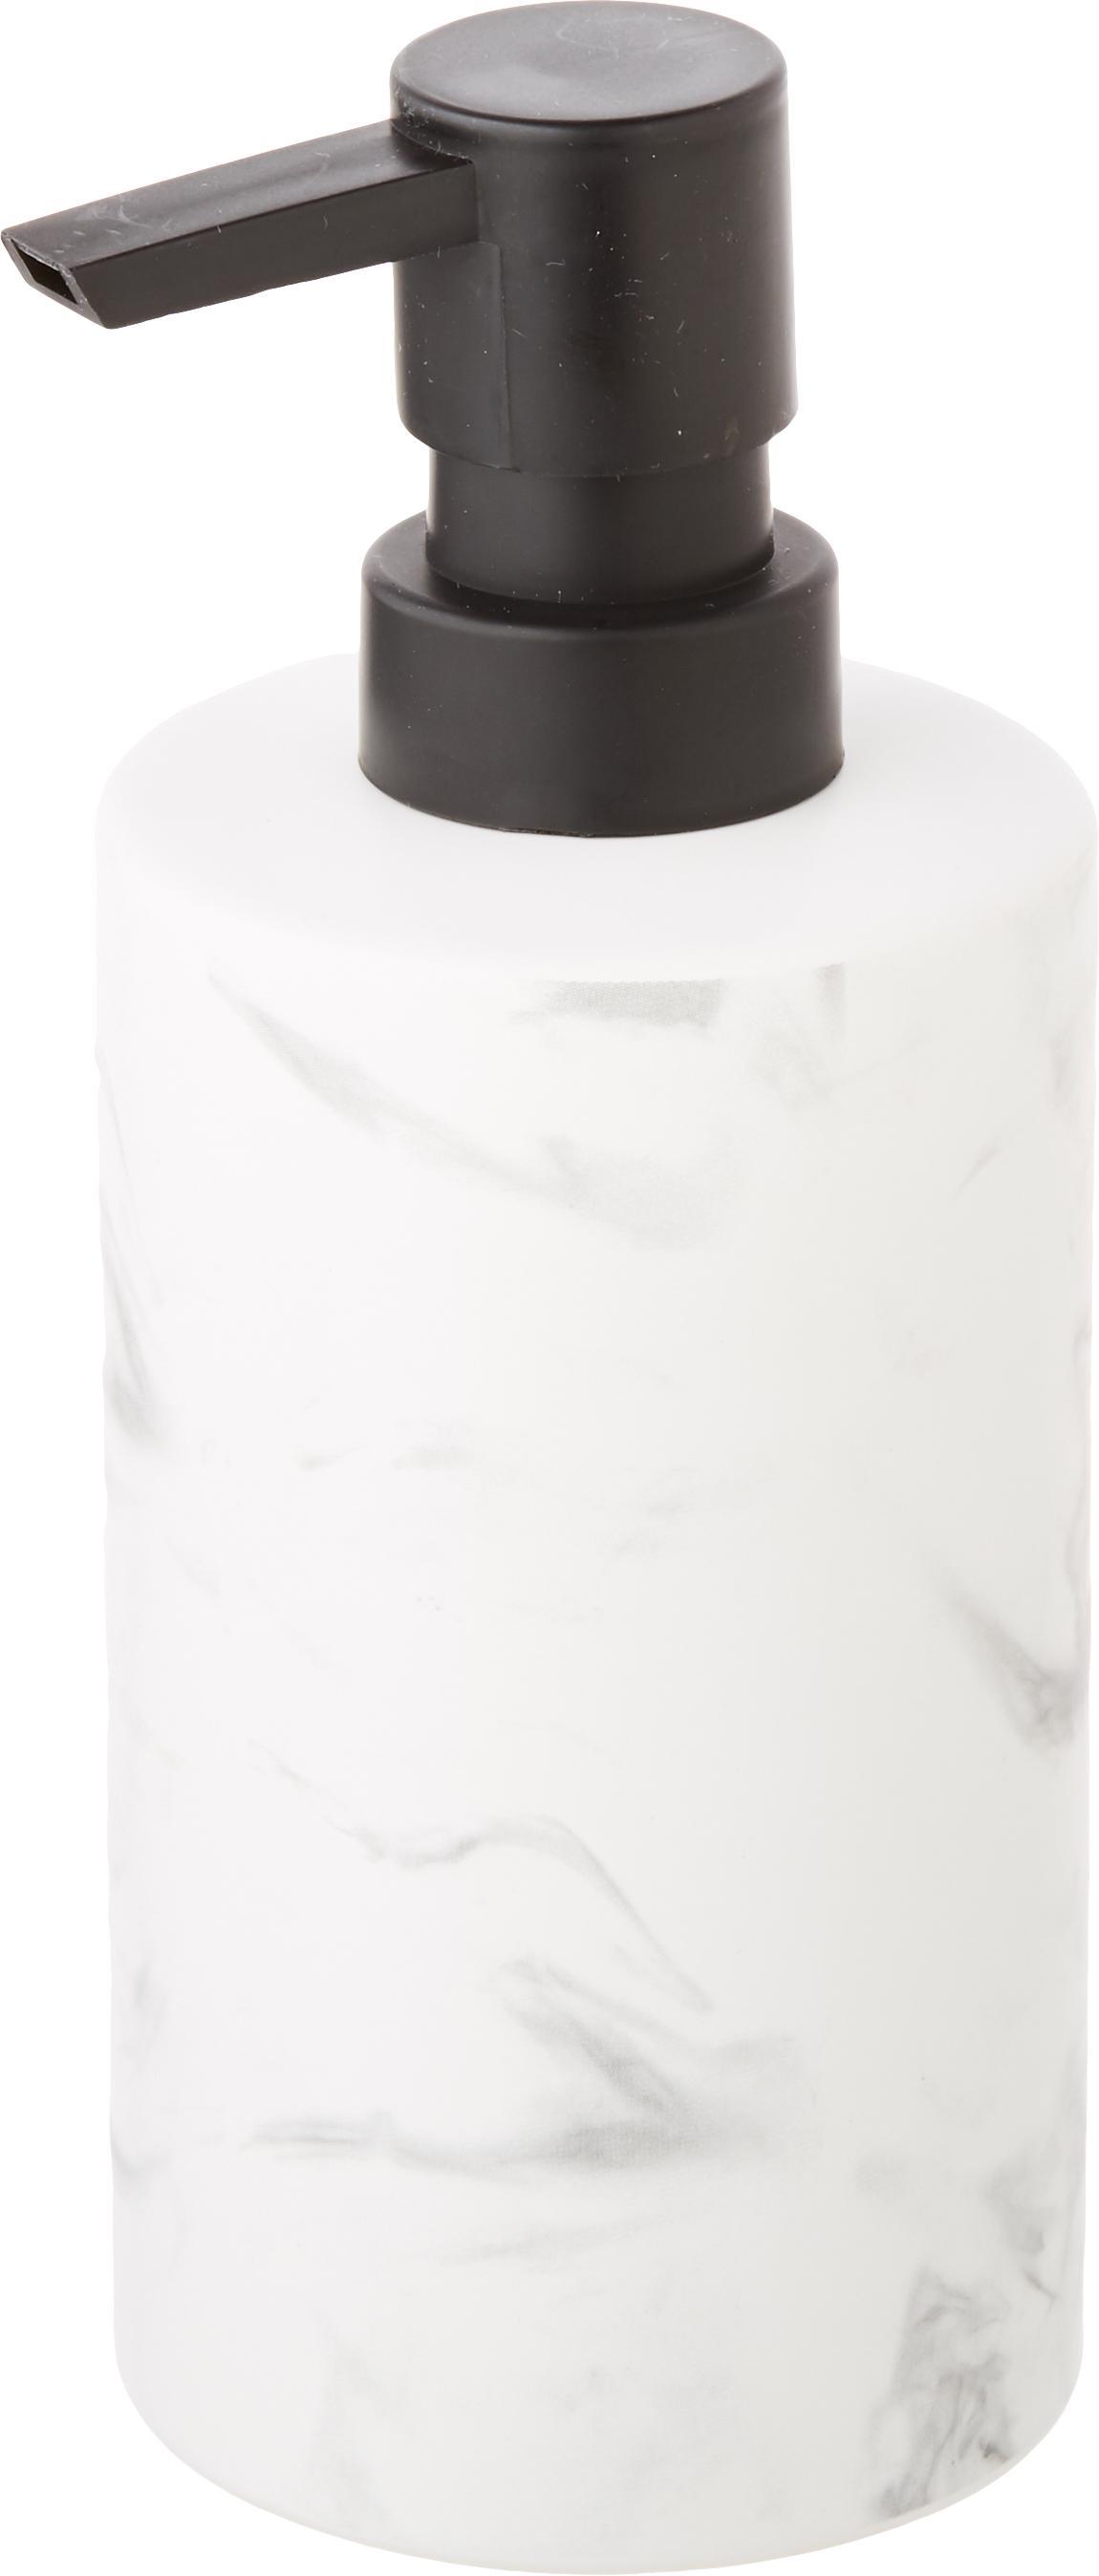 Keramik-Seifenspender Daro, Behälter: Keramik, Pumpkopf: Metall, beschichtet, Weiß, Schwarz, Ø 7 x H 18 cm